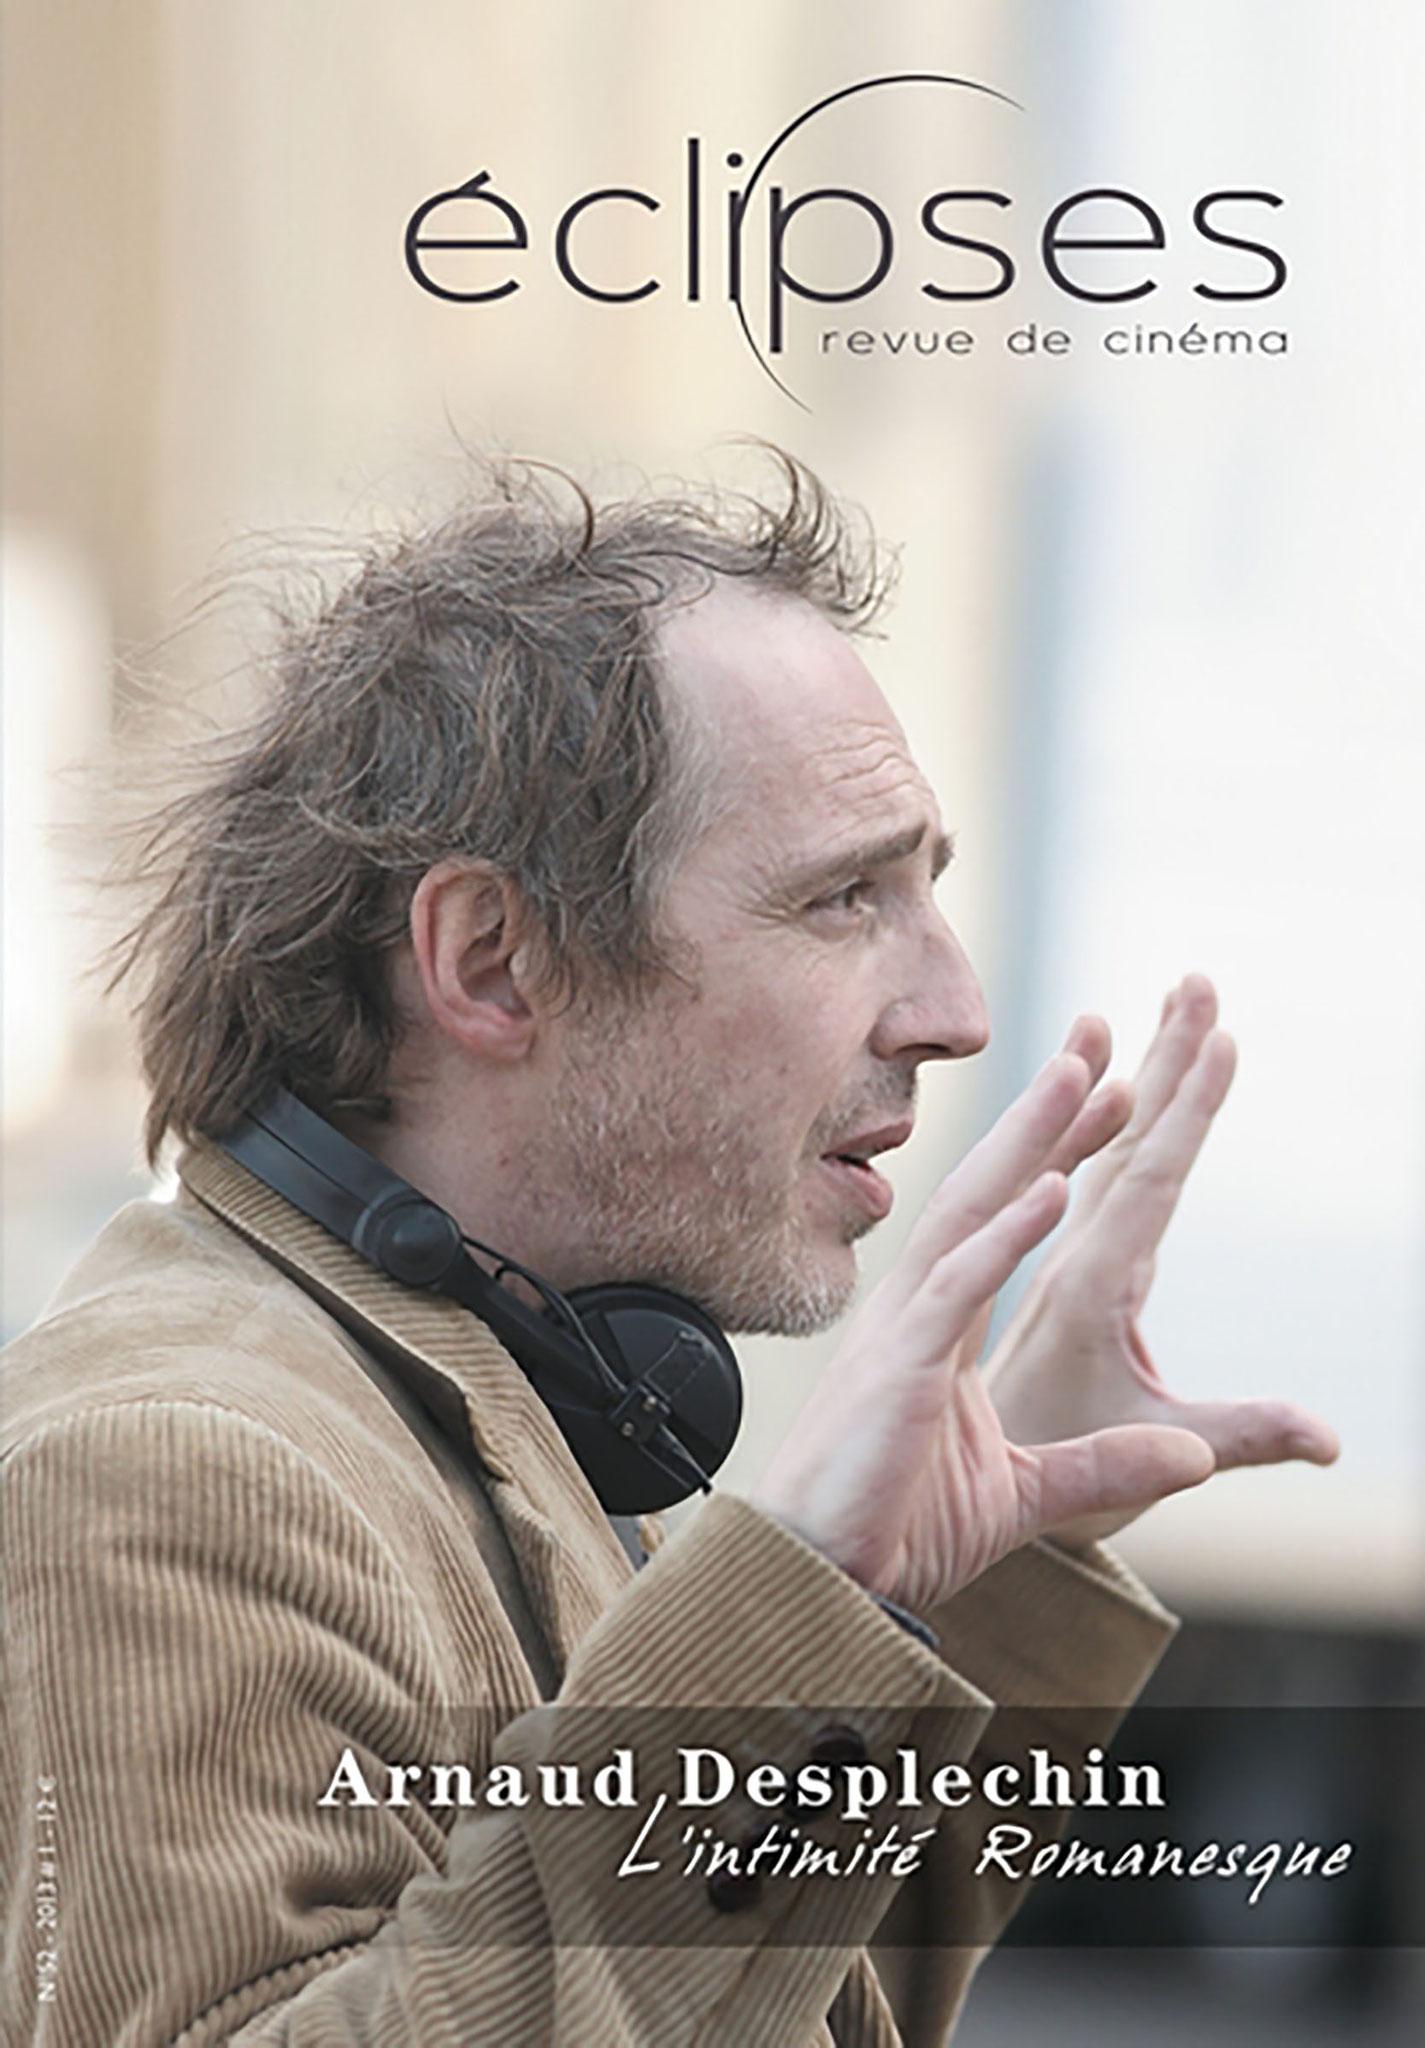 Conférence Arnaud Desplechin - Samedi 25 mars à 14h30